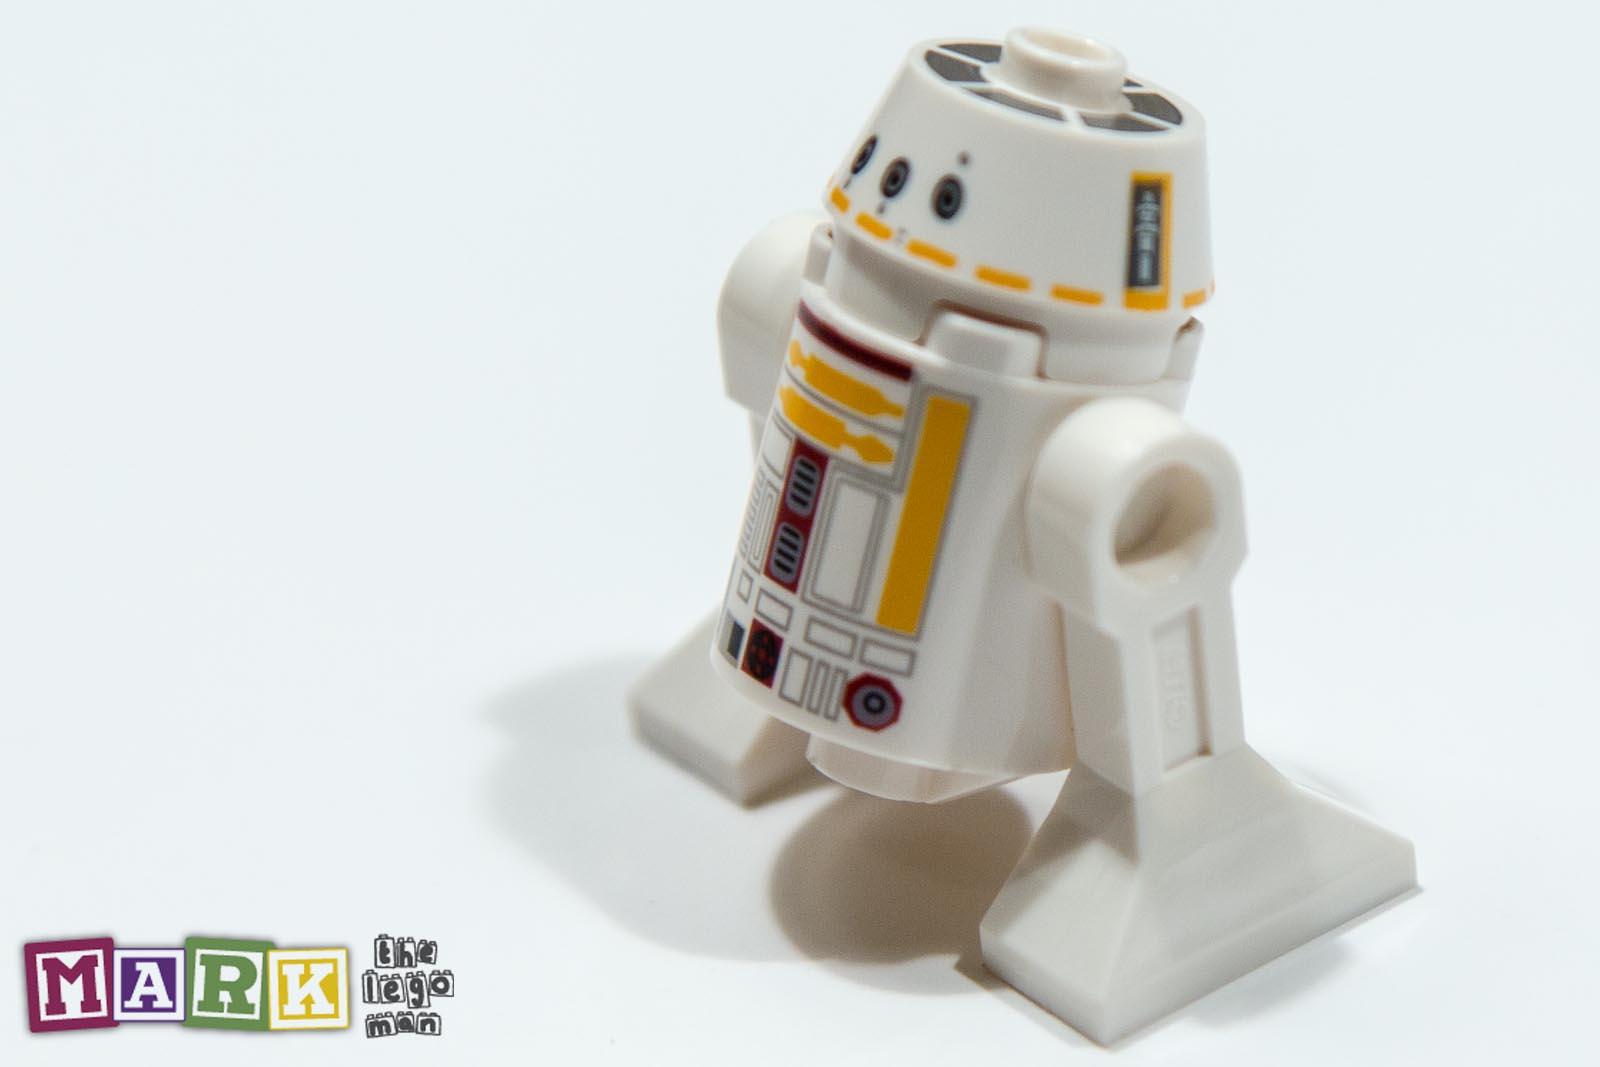 New lego star wars minifig r5 f7 droid like r2 d2 shape 75023 2 mad about bricks - Lego starwars r2d2 ...